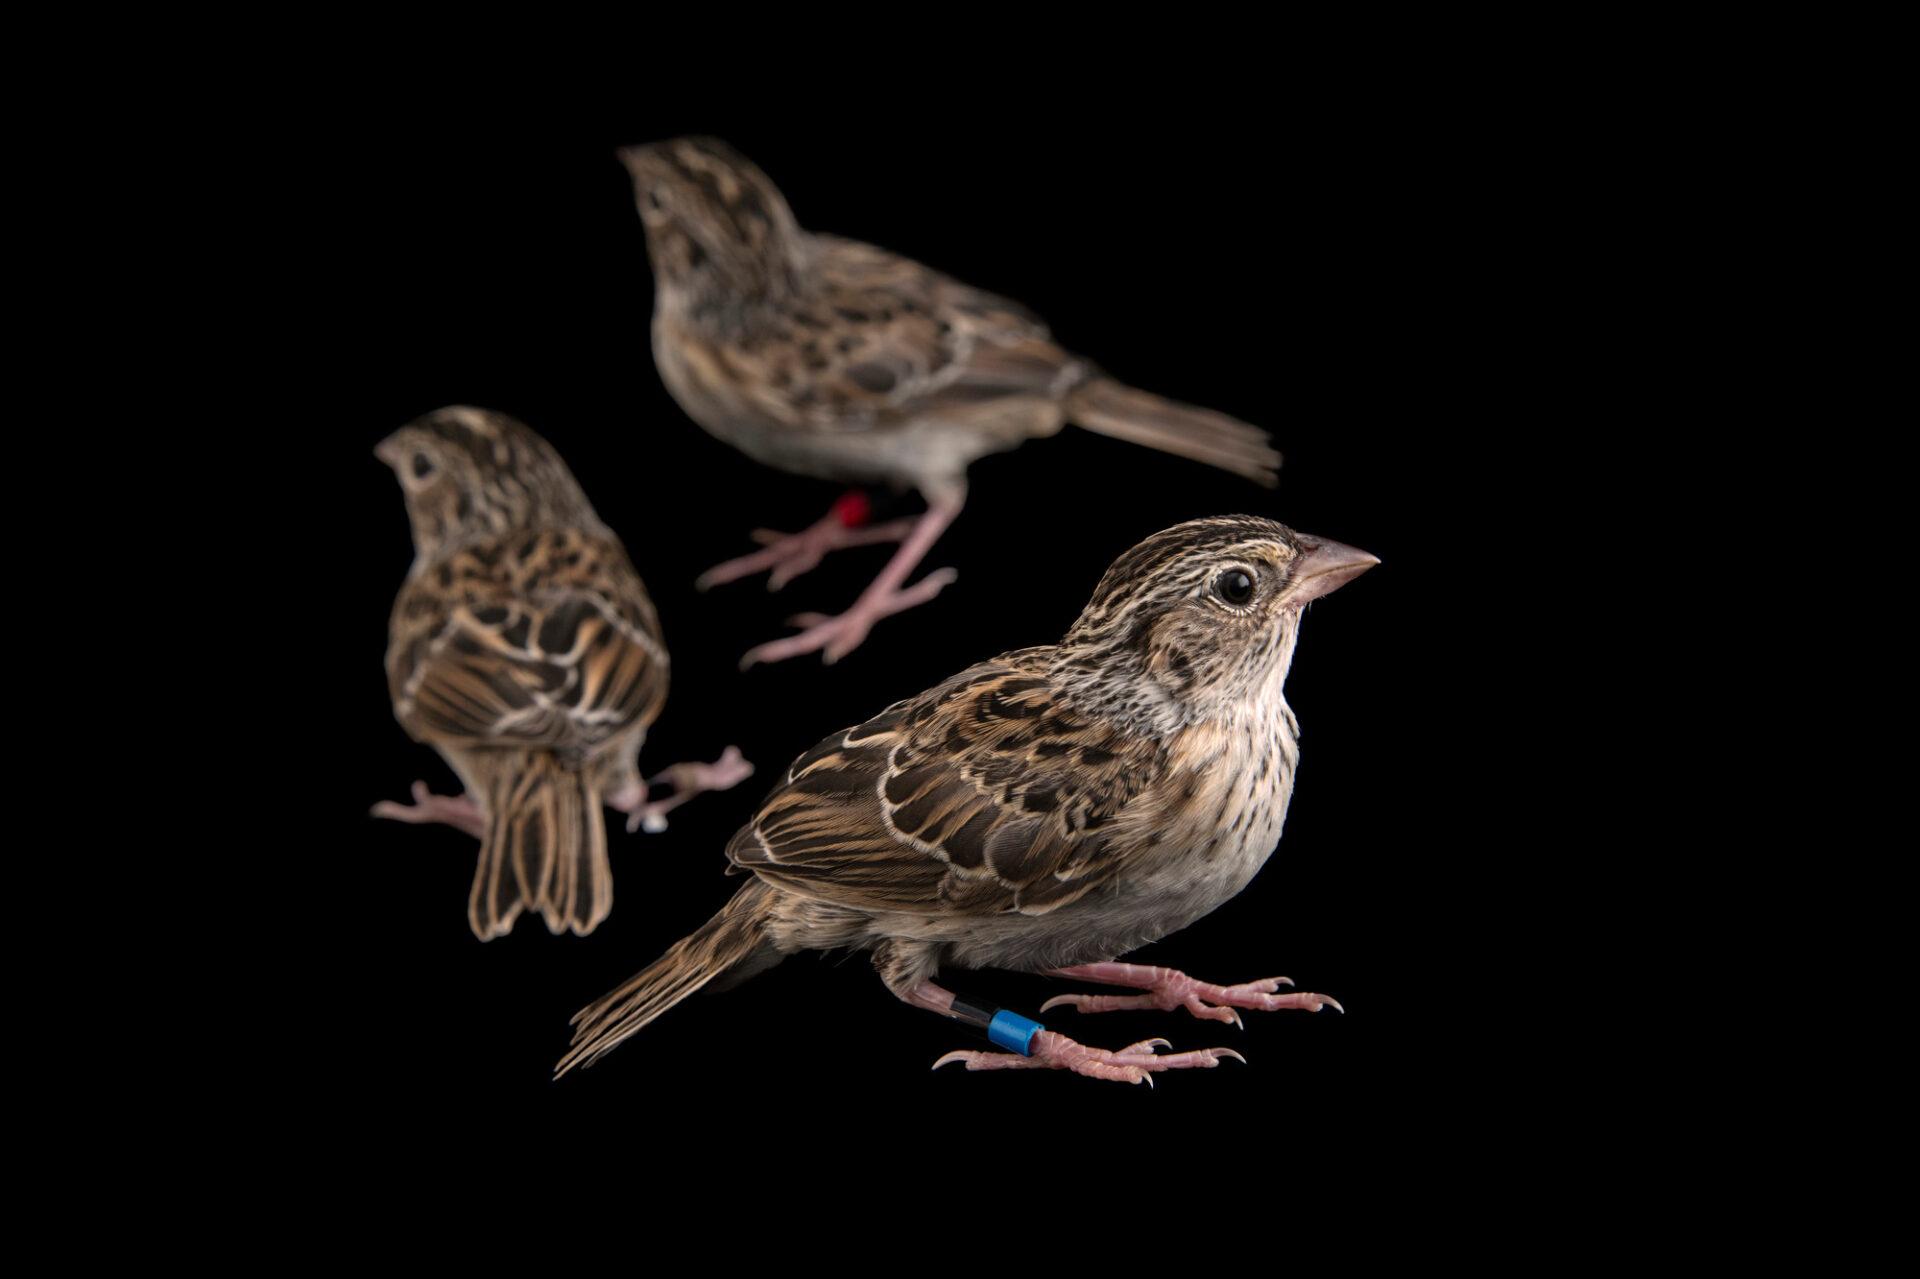 Photo: Three 20-day-old fledgling Florida grasshopper sparrows (Ammodramus savannarum floridanus) at White Oak Conservation Center, Yulee, Florida.